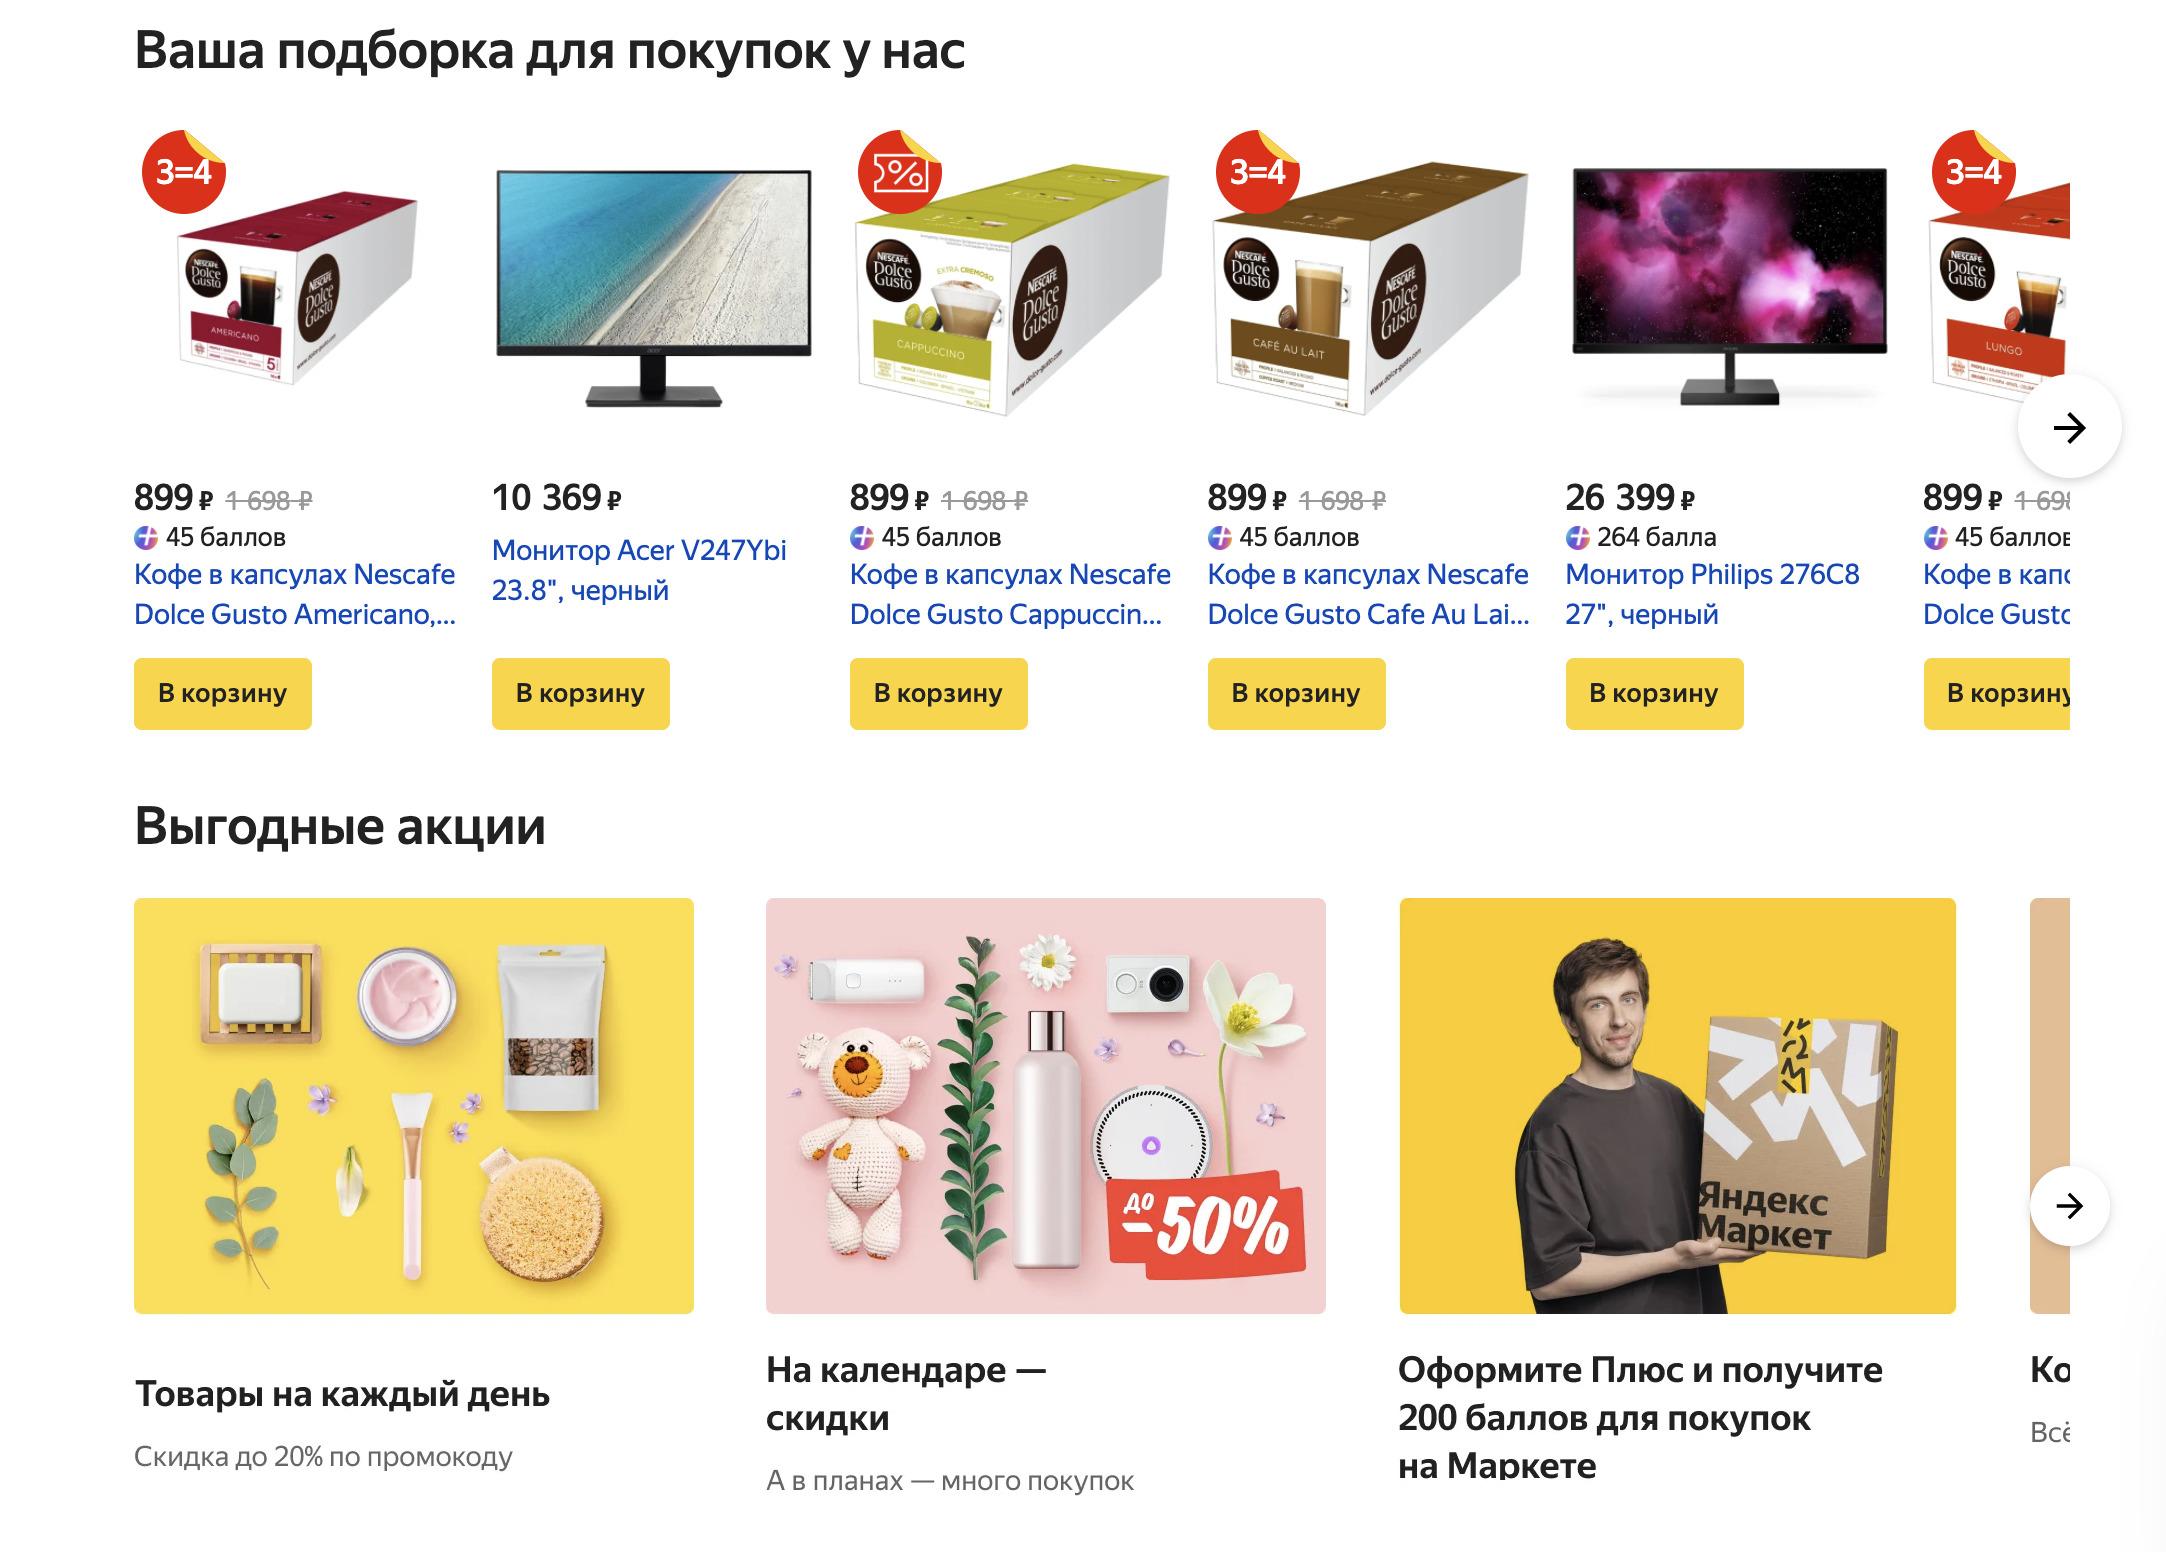 Доставка из Яндекс.Маркет в Салават, сроки, пункты выдачи, каталог